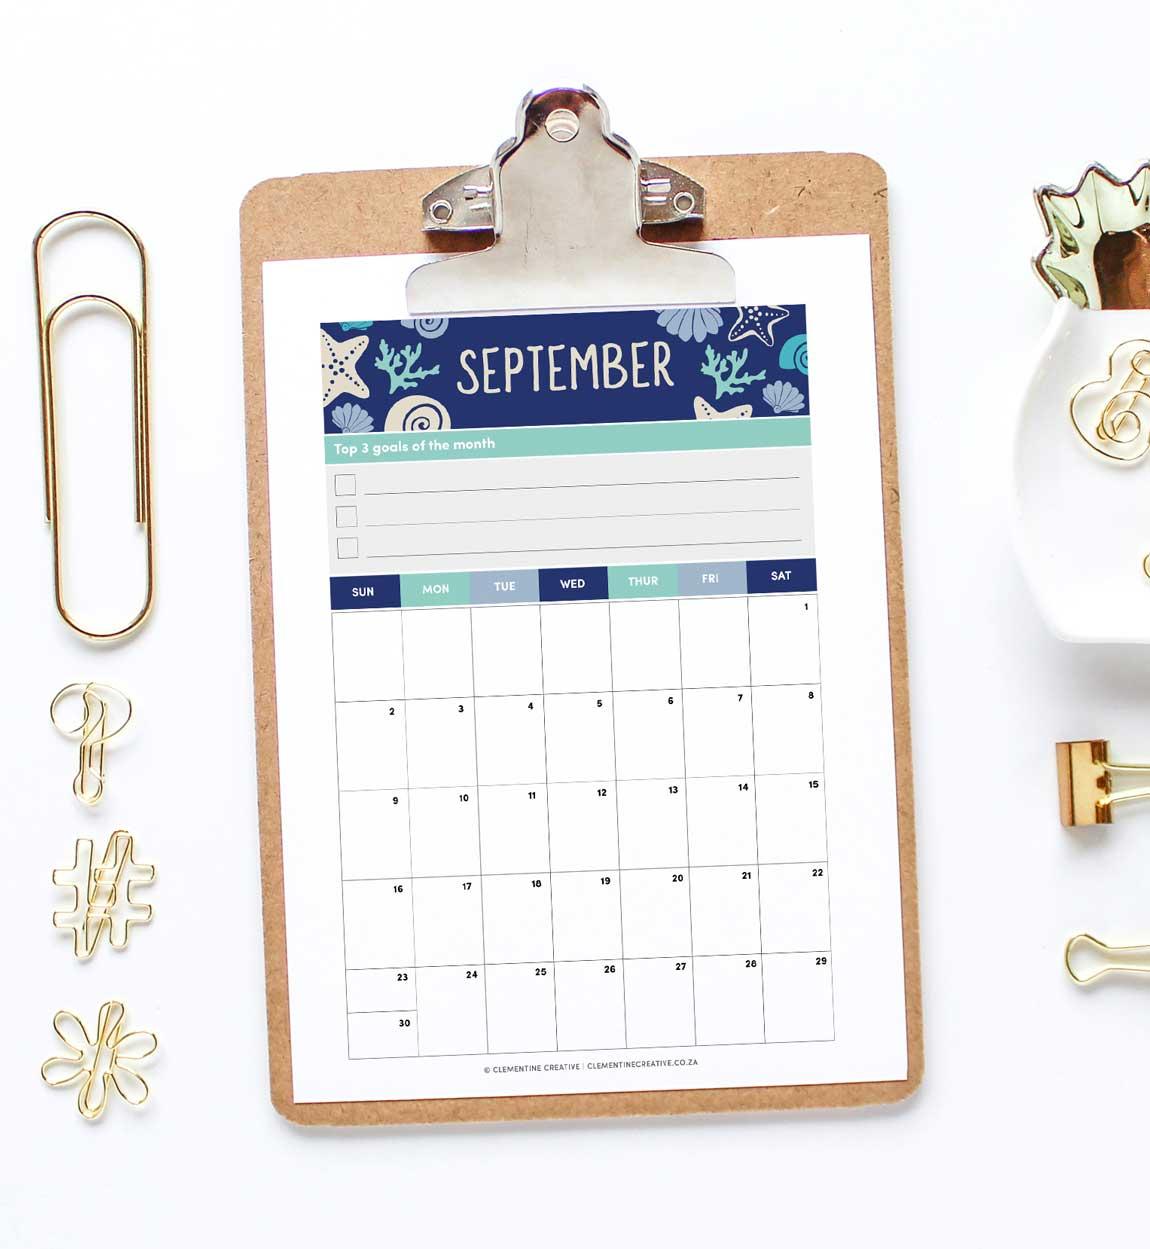 September 2018 free printable calendar